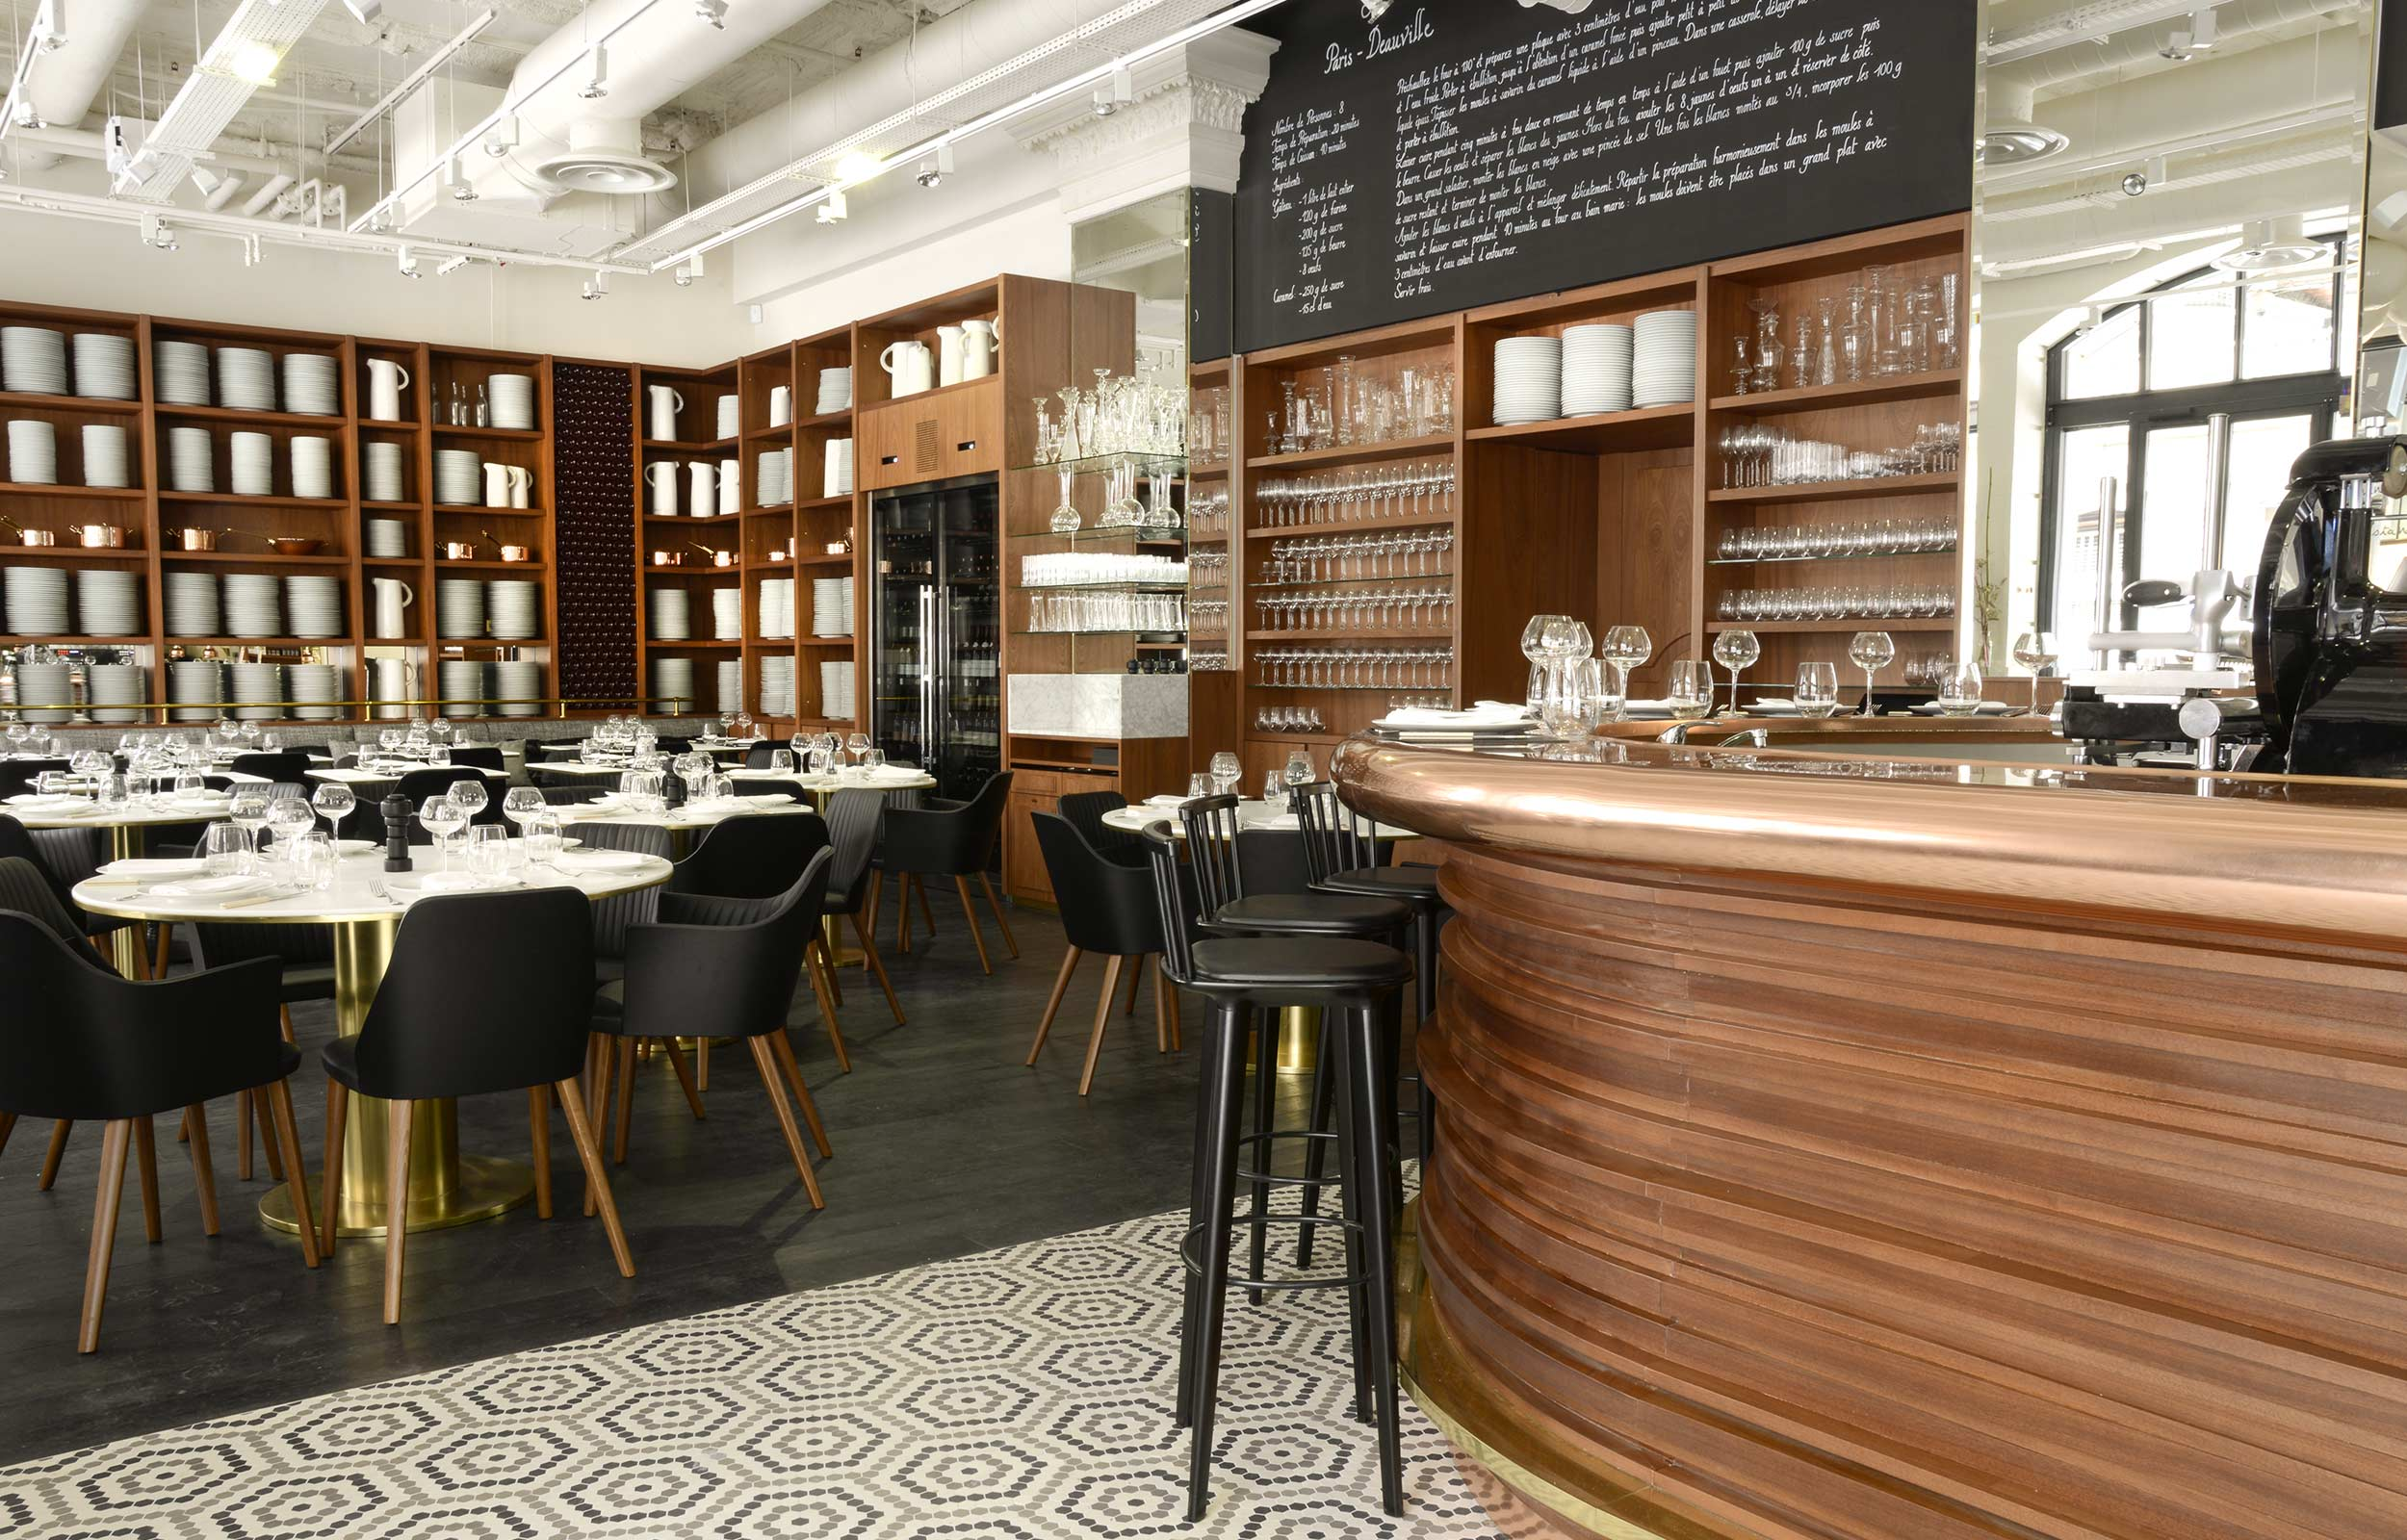 Restaurant lazare paris eric frechon - Restaurant gare saint lazare ...